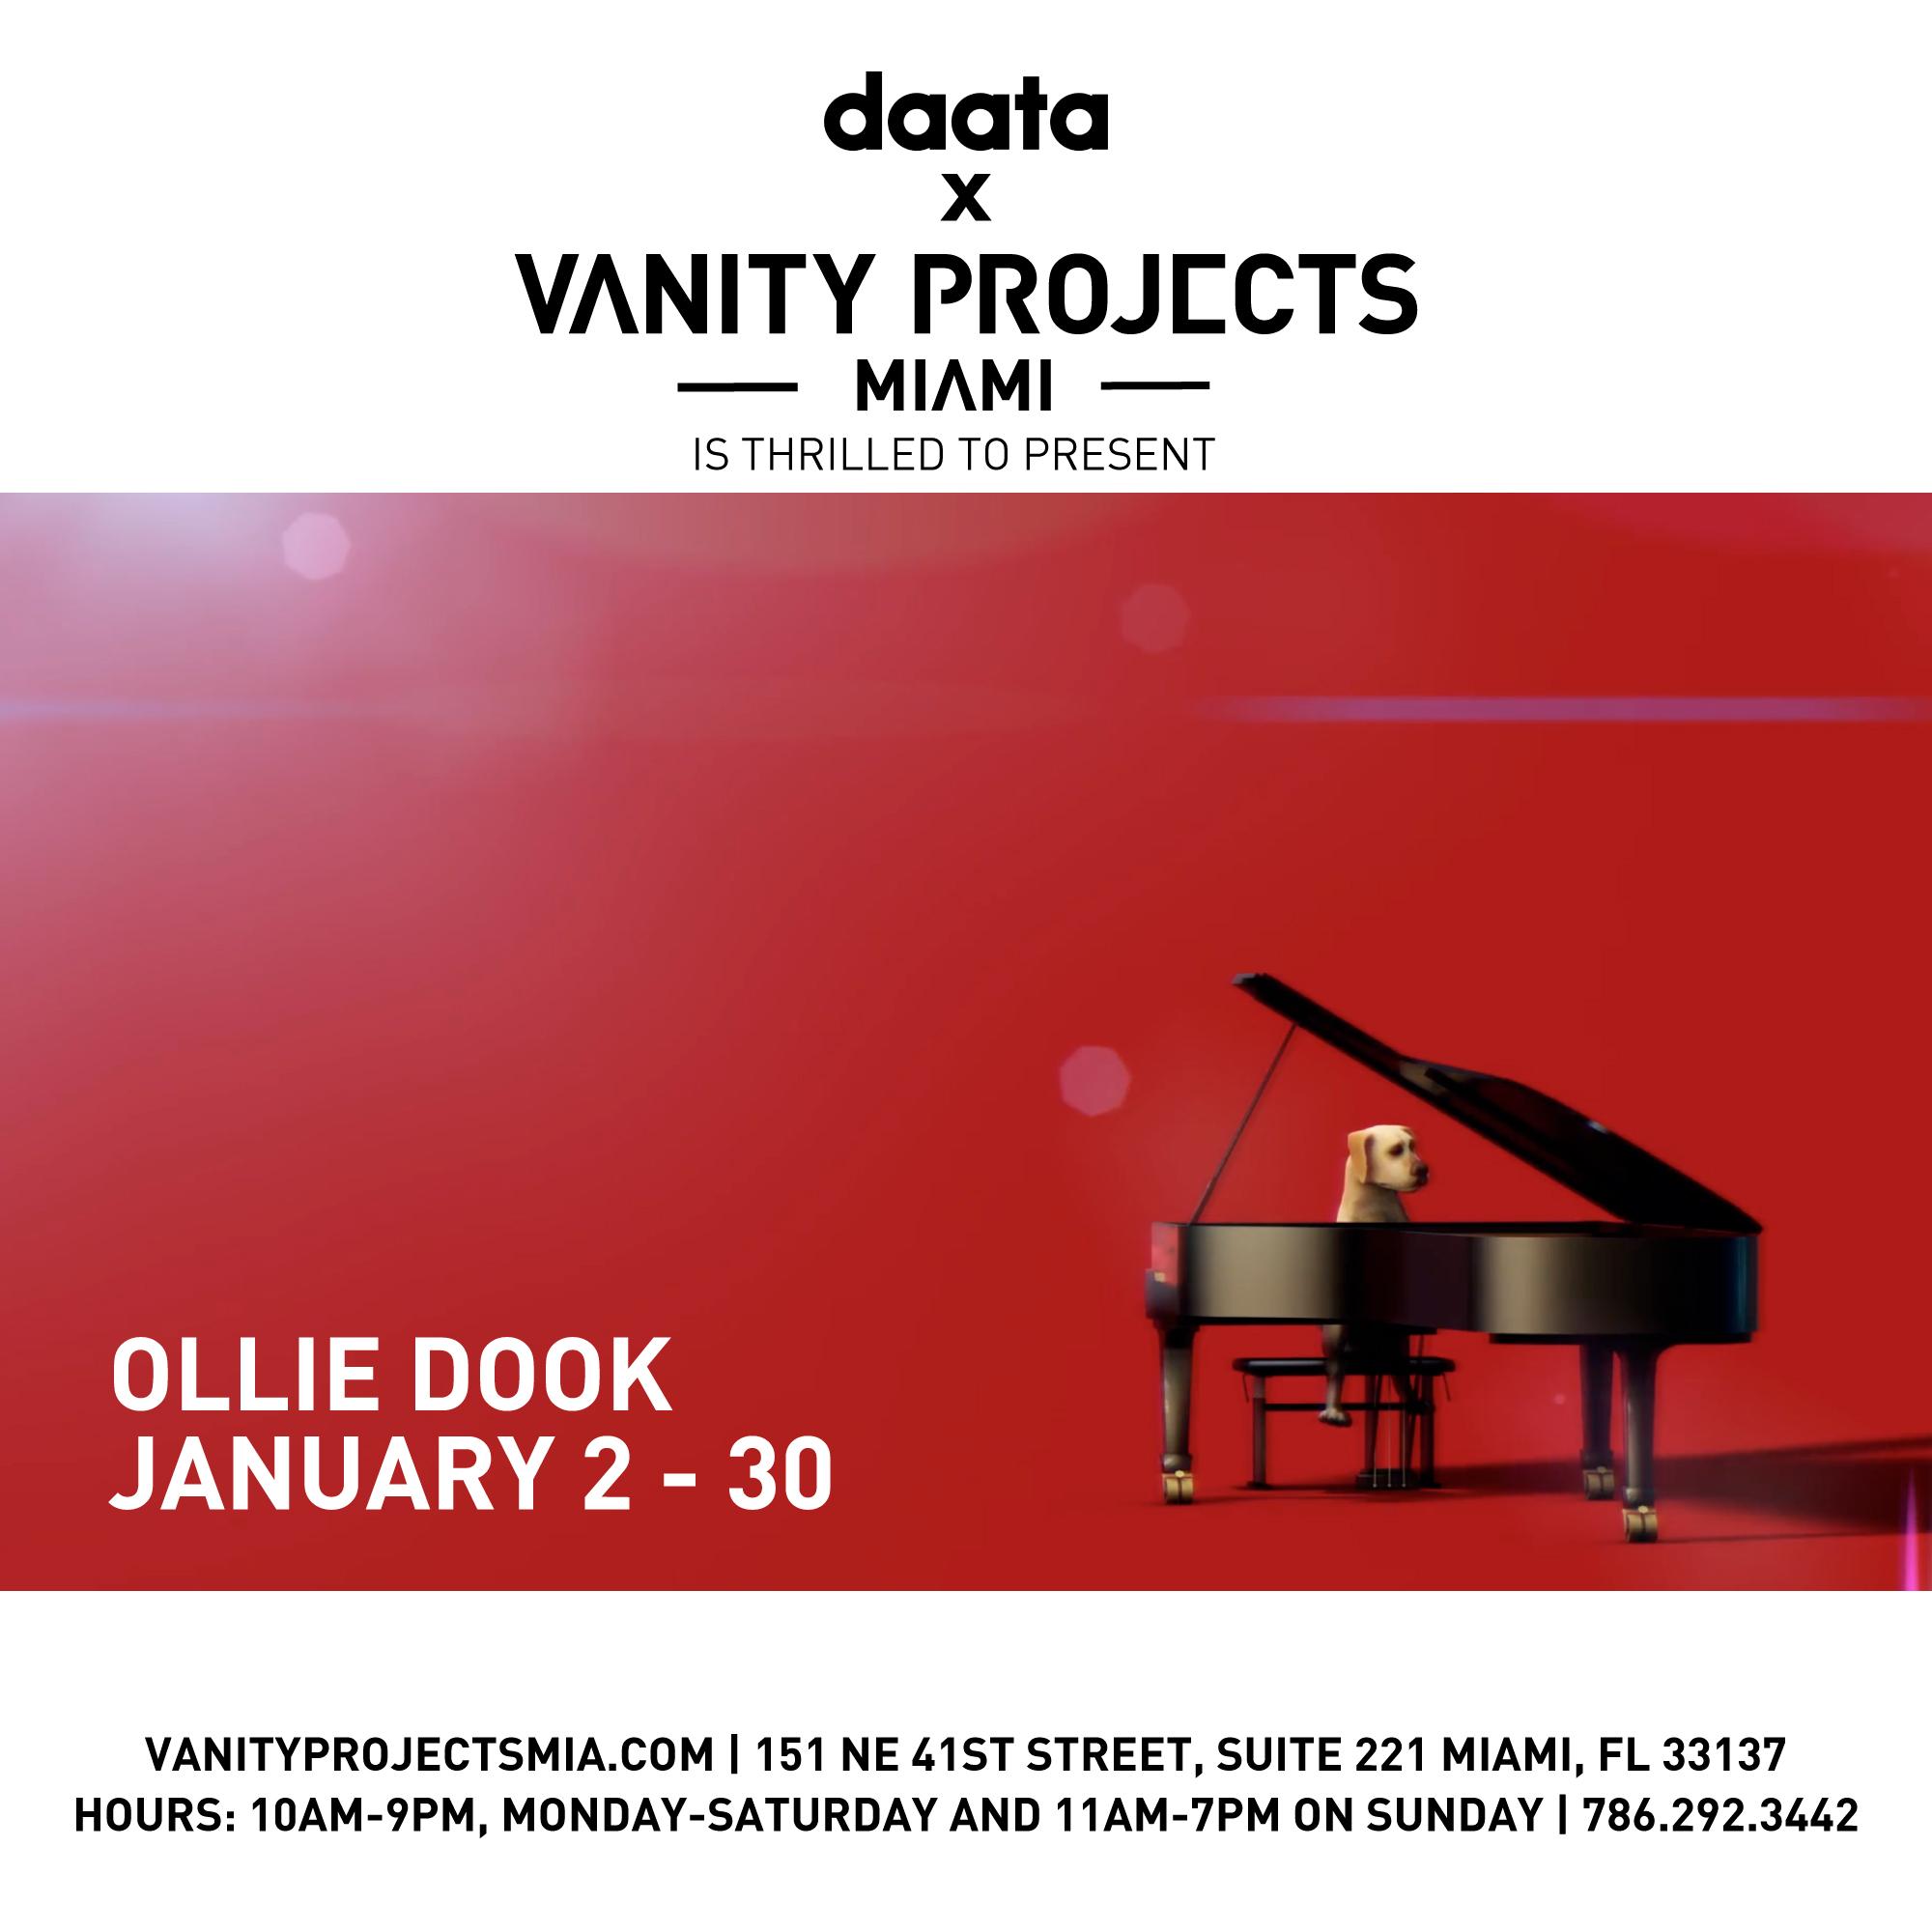 vp_announcements_daata_ollie_dook_mia.jpg